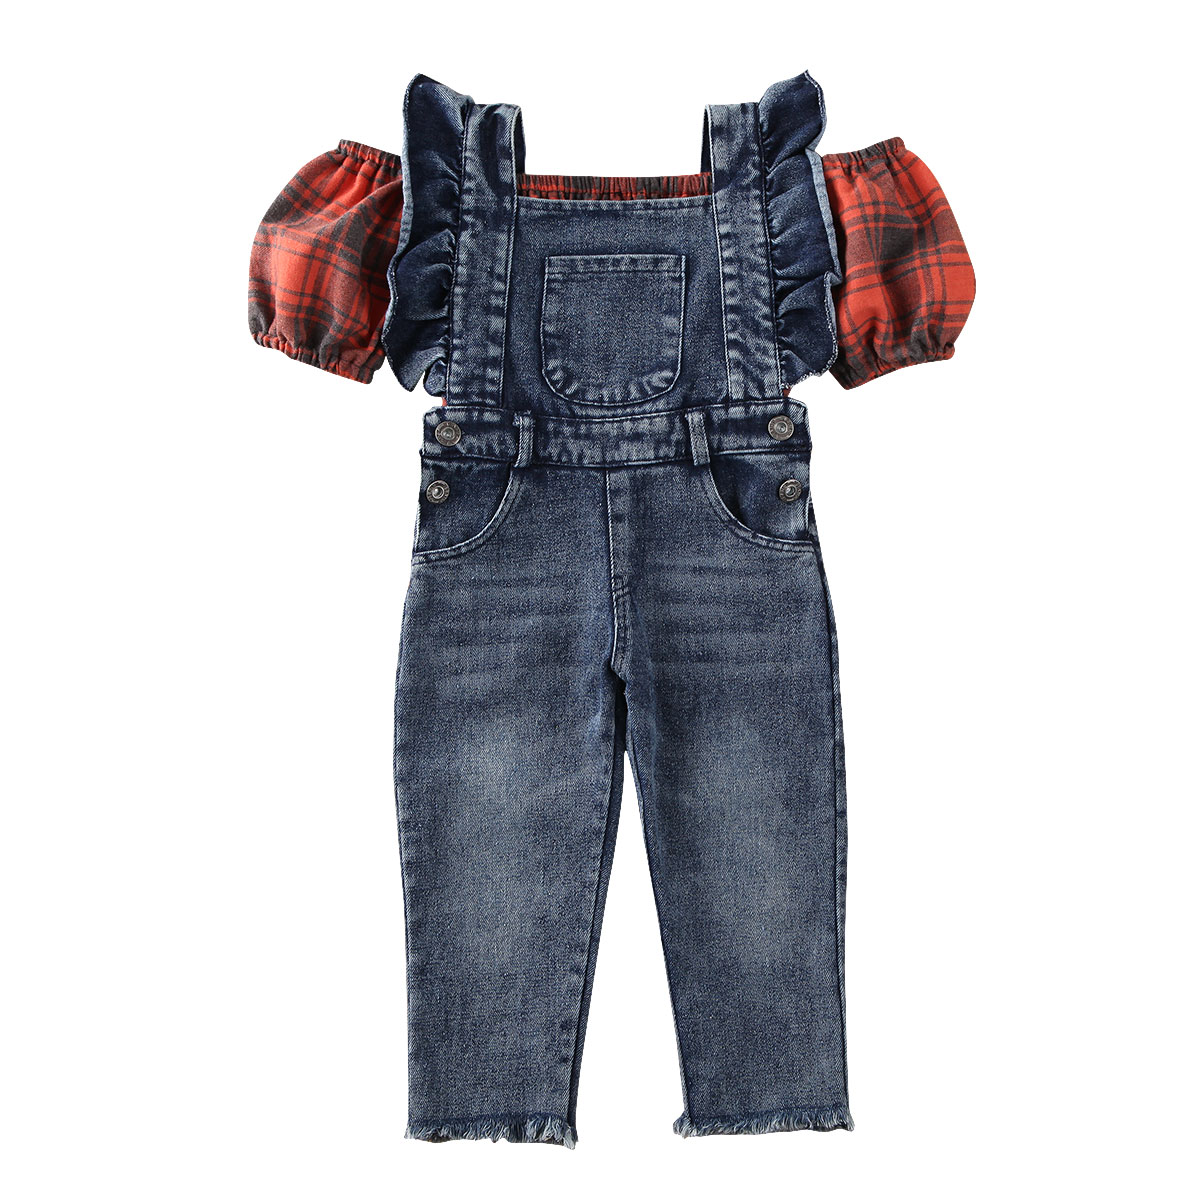 Dulce bebé chica chico globo manga Plaid chaleco Tops Denim babero pantalones de moda Niñas Ropa conjunto